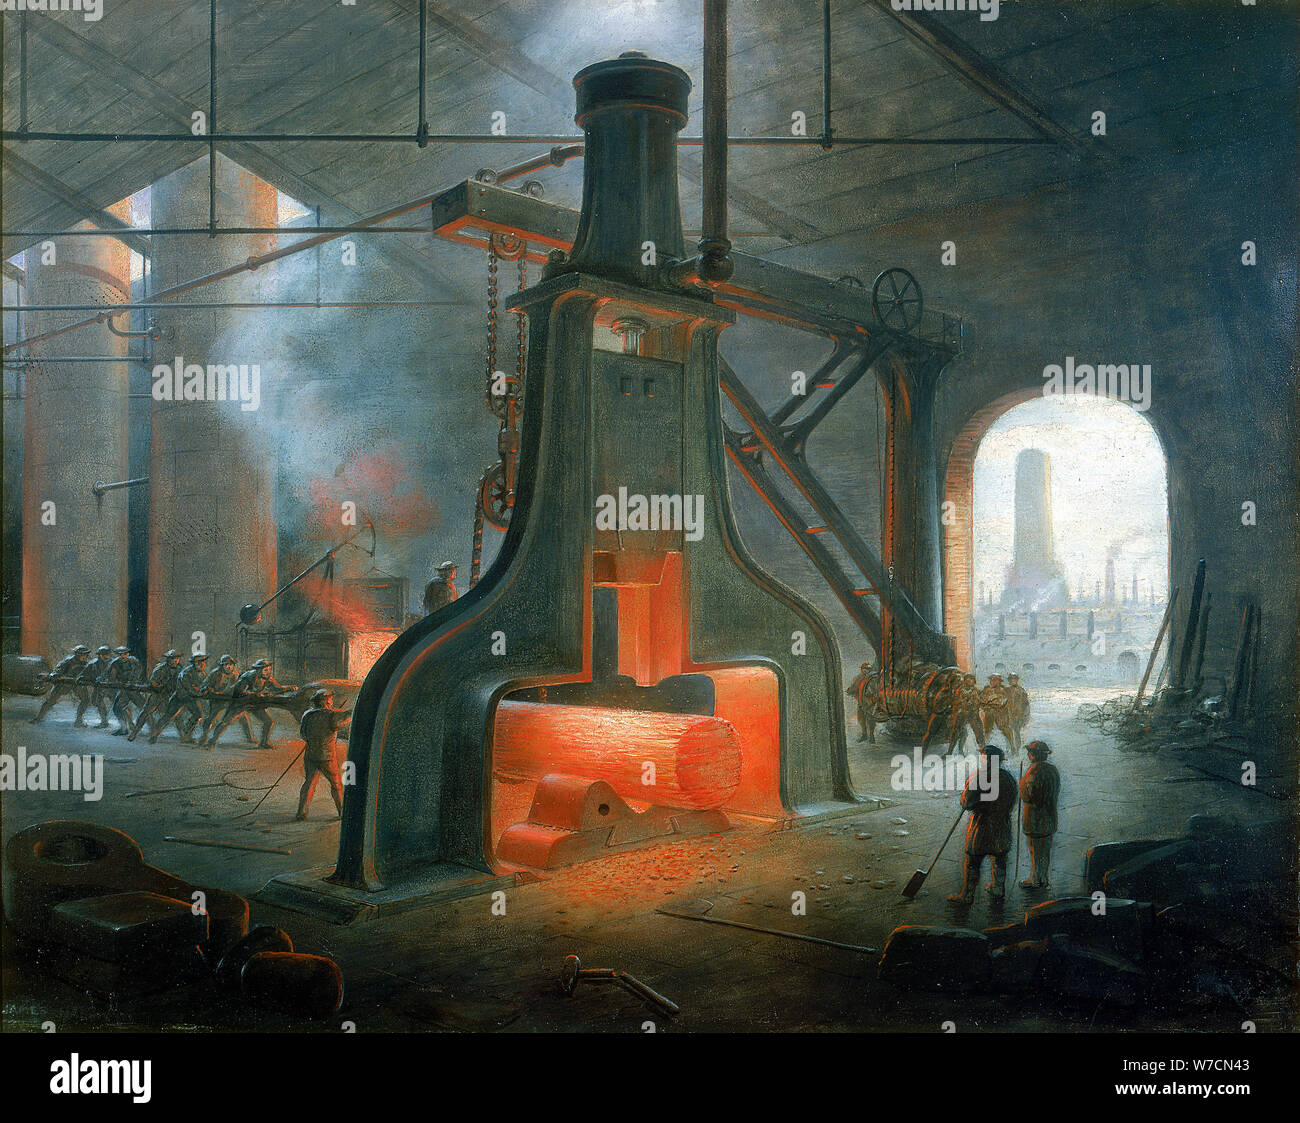 James Nasmyth's steam hammer erected in his foundry near Manchester in 1832. Artist: James Nasmyth Stock Photo